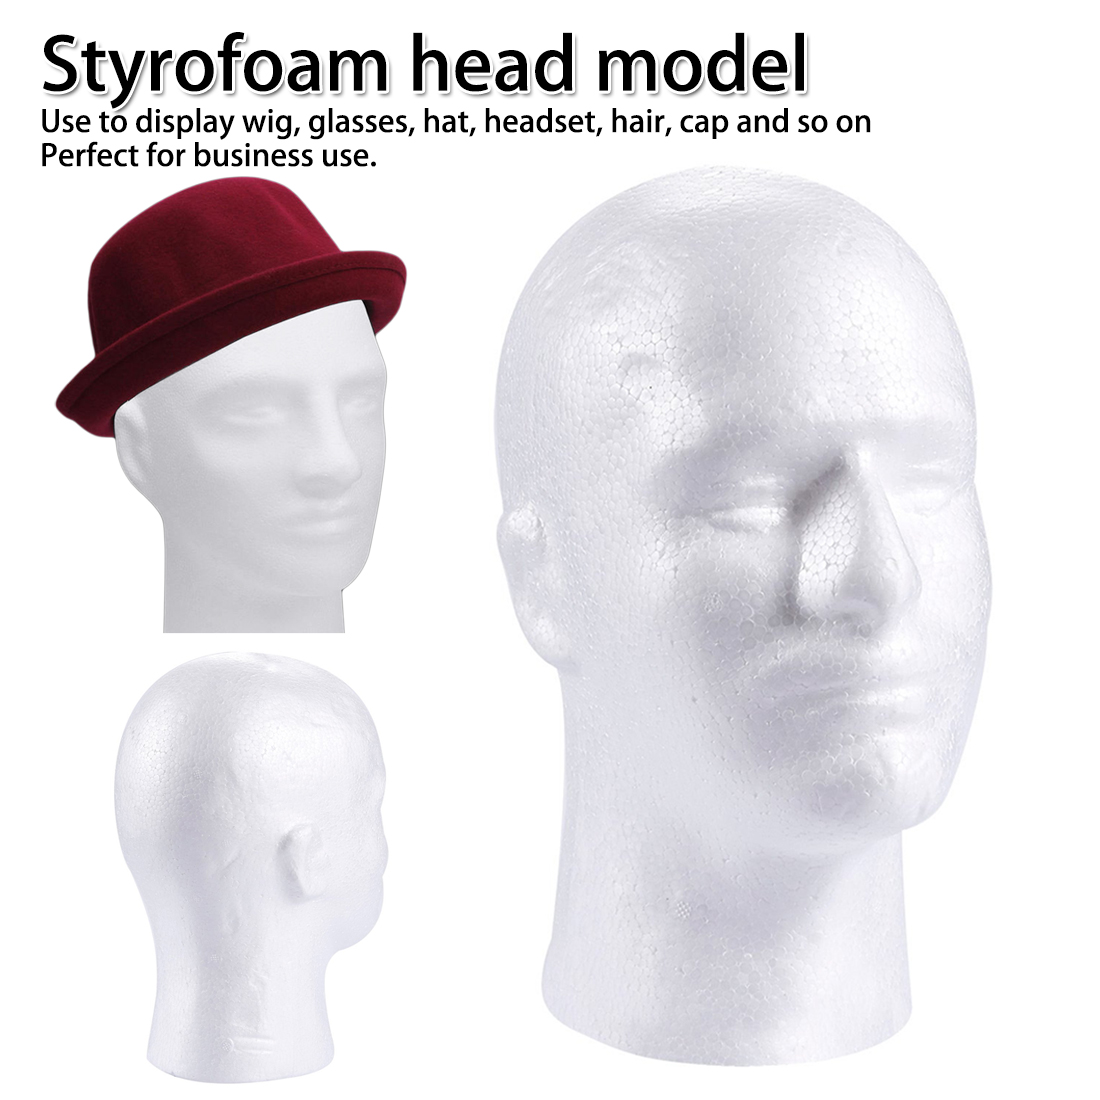 5 x POLYSTYRENE MALE DISPLAY WIG HAT HEAD MANNEQUINS